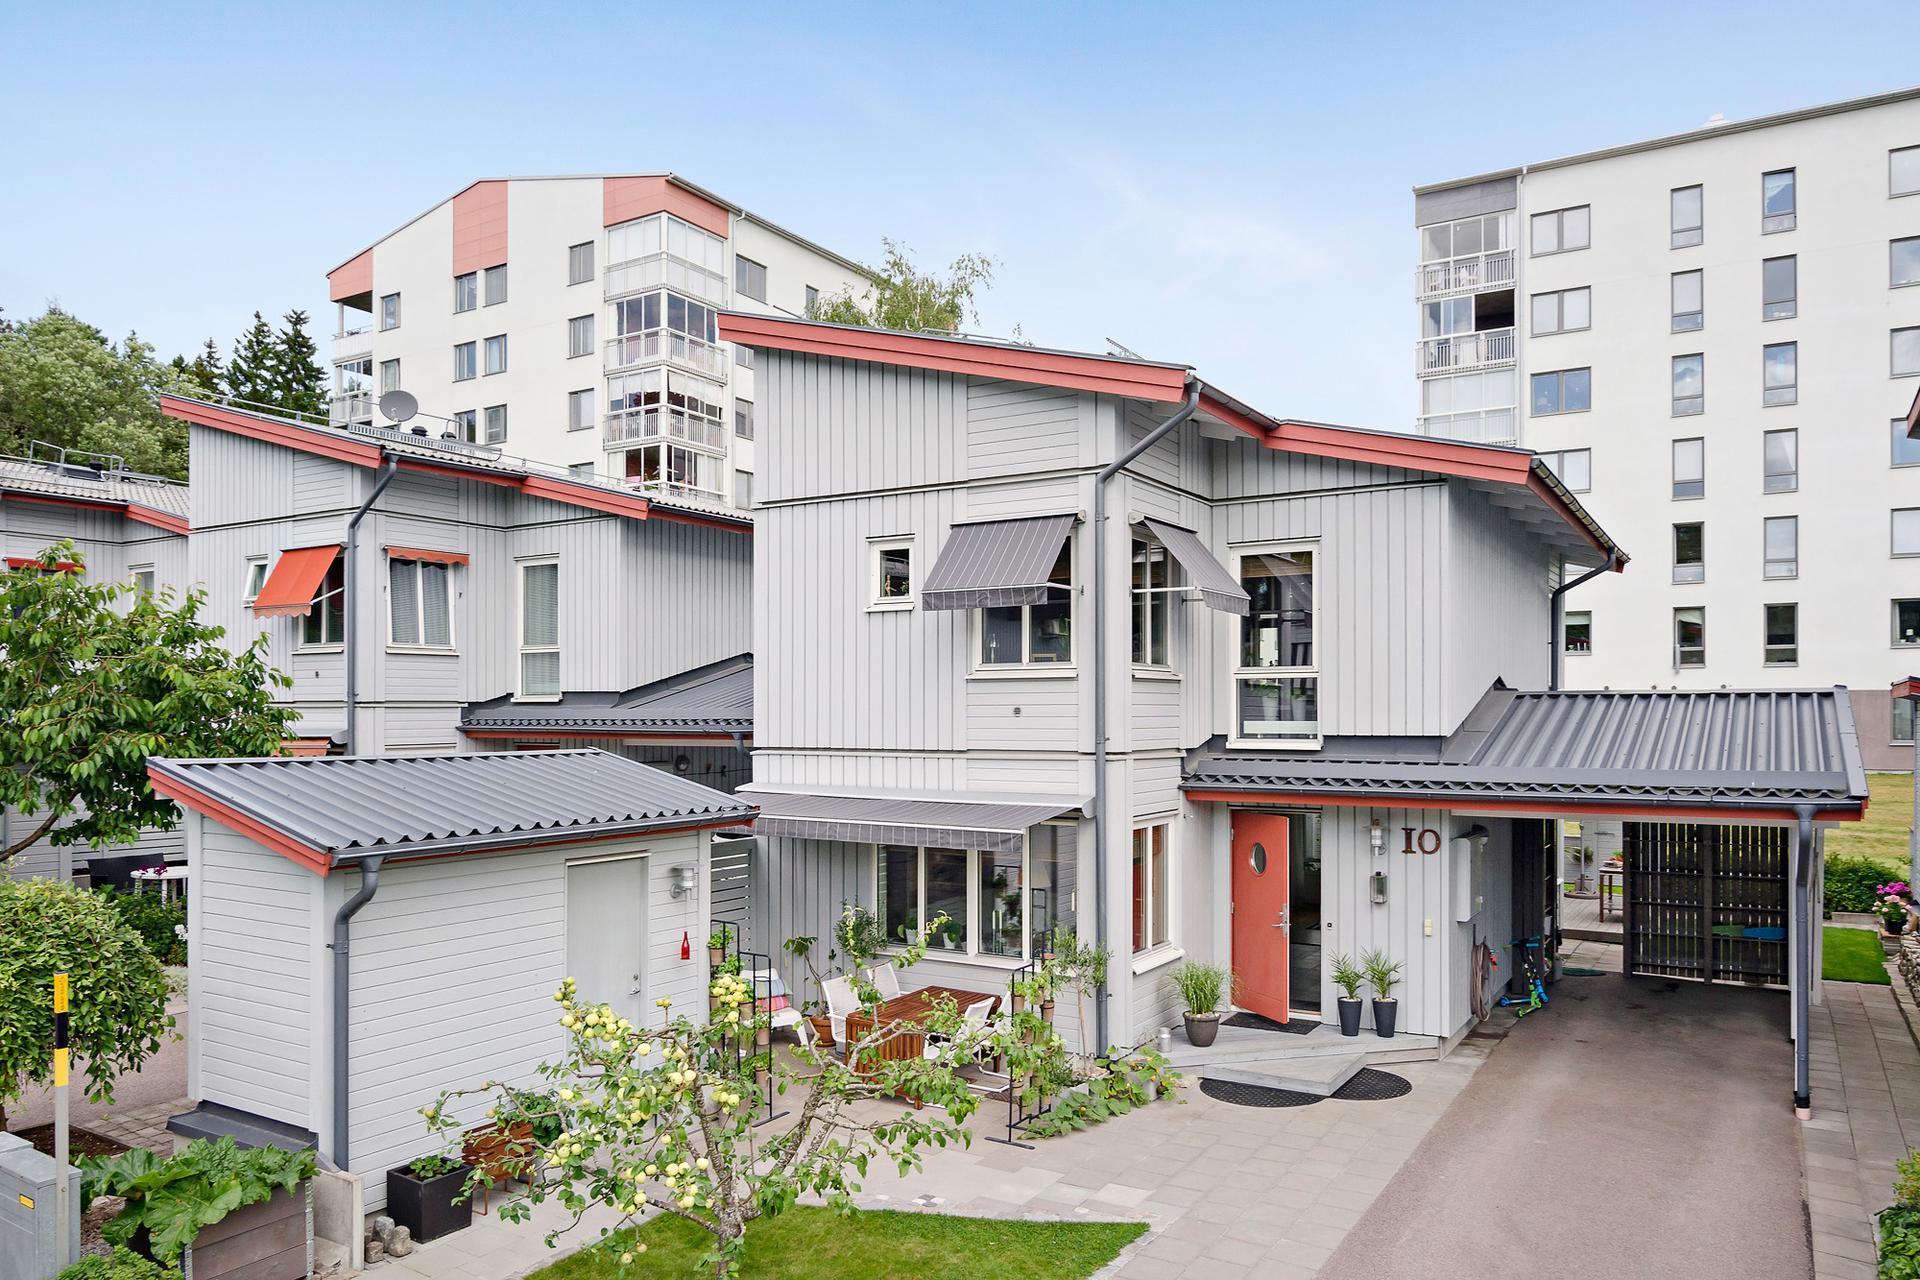 Маркизы на окнах дома в Швеции